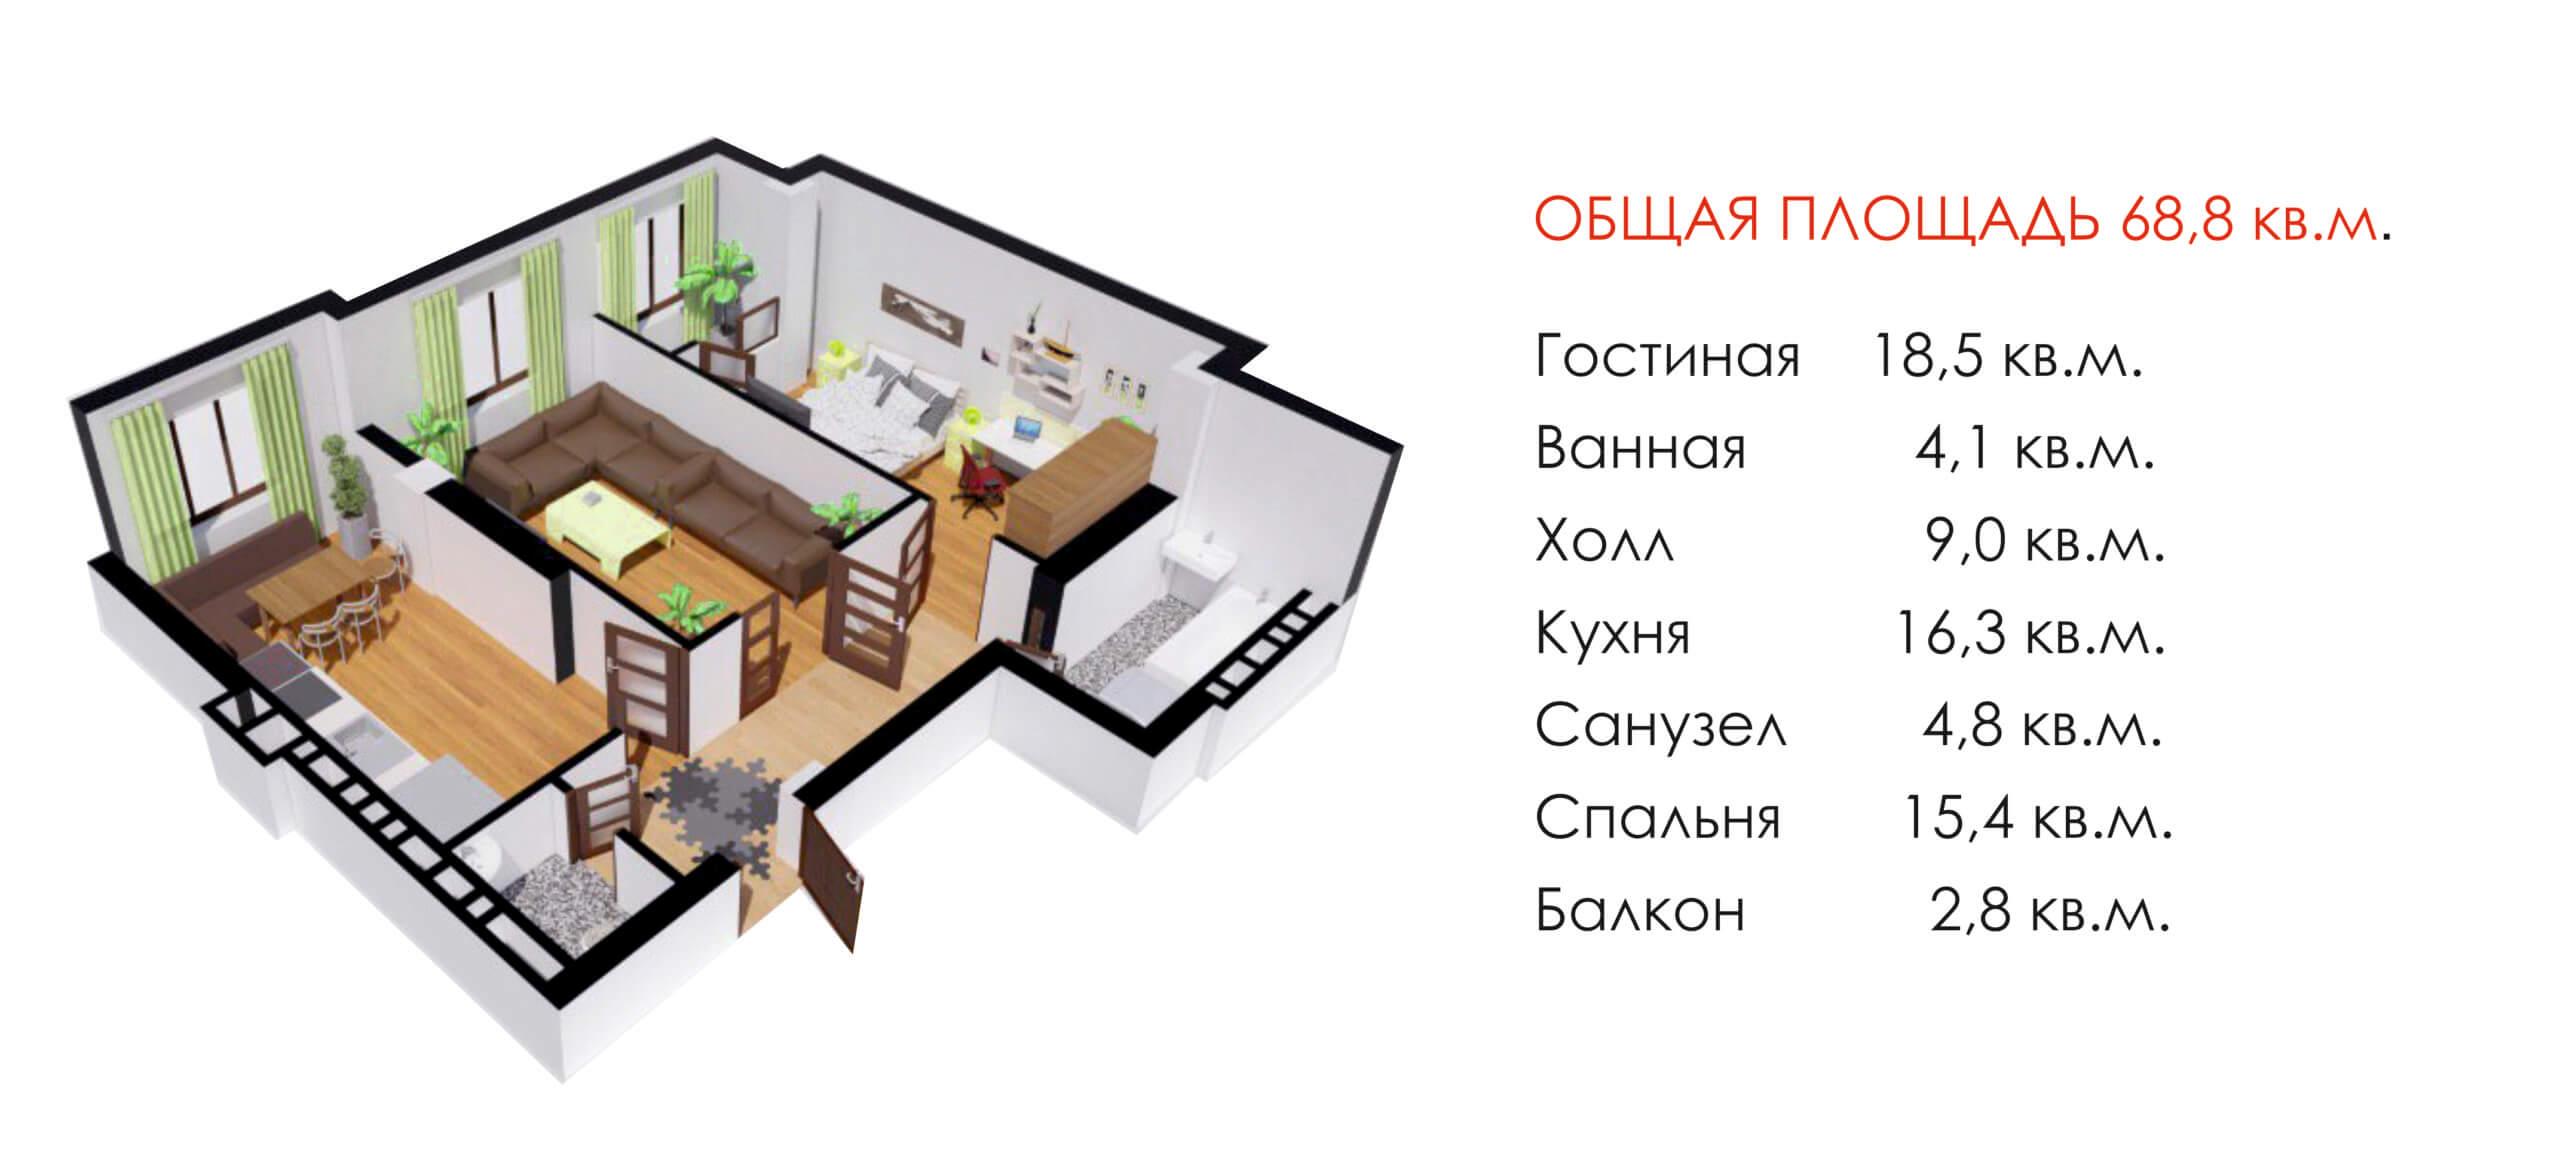 2-х комнатная квартира 68,8 кв.м.